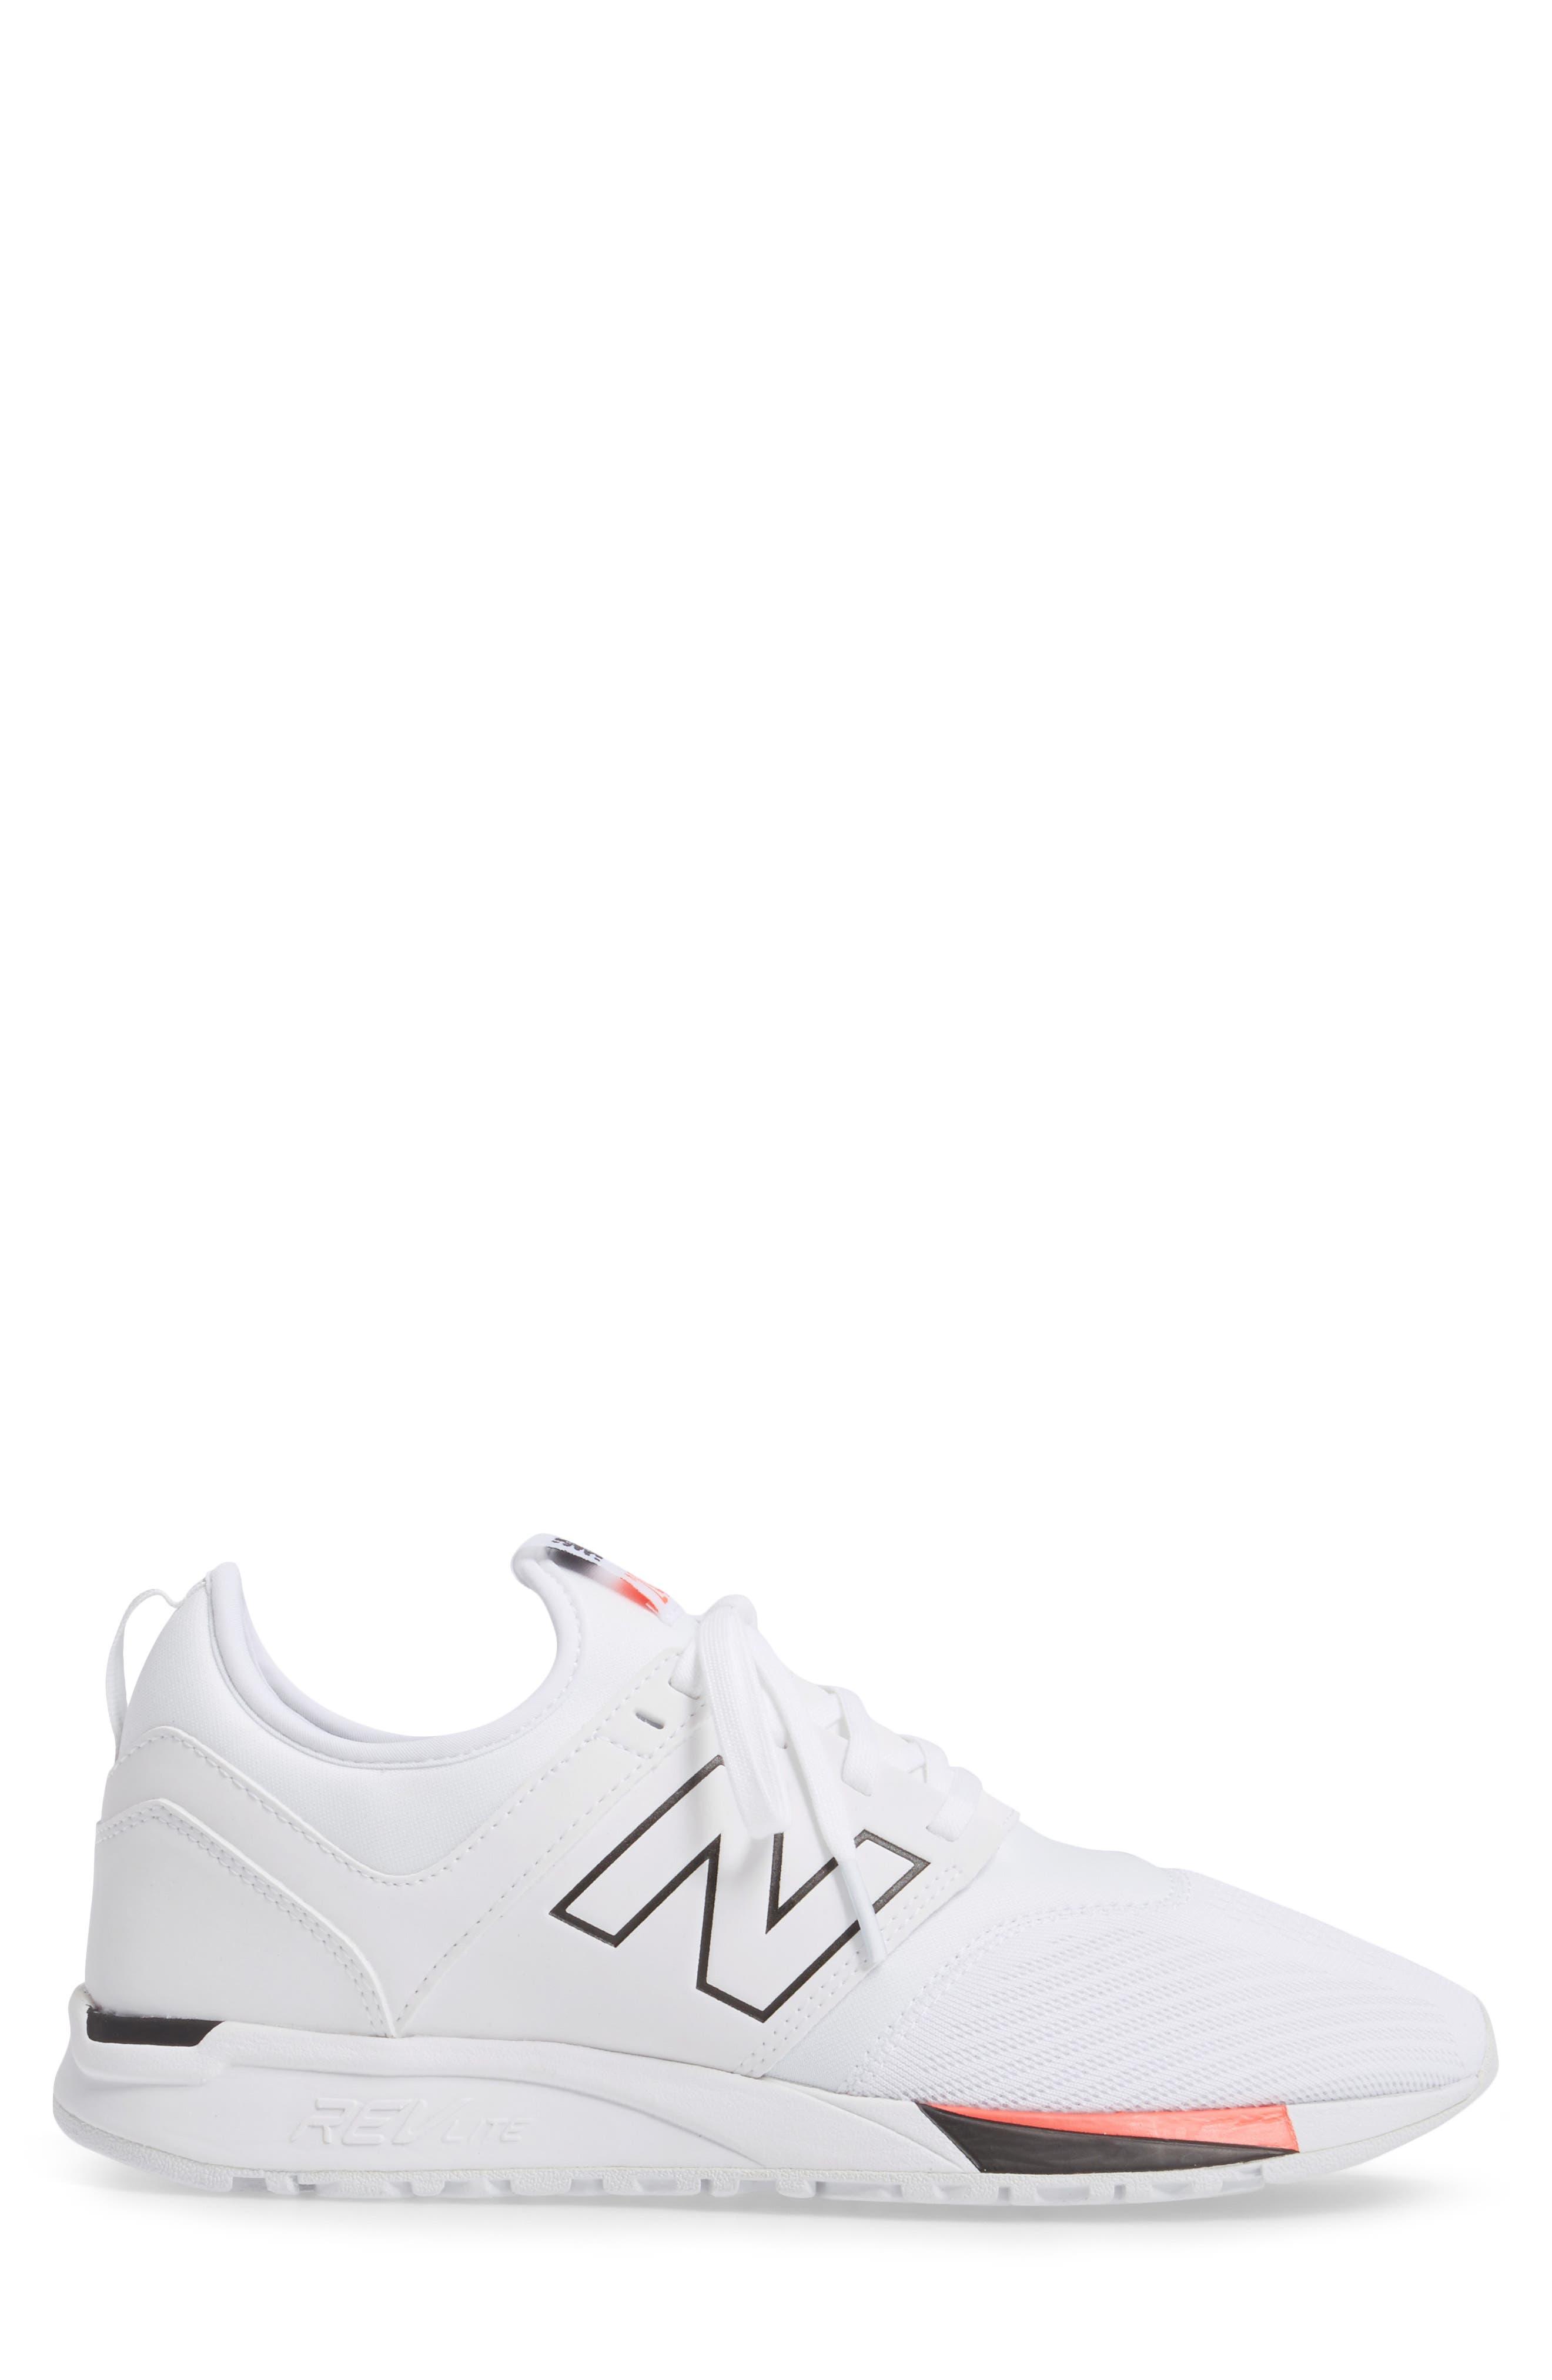 247 Classic Plus Sneaker,                             Alternate thumbnail 3, color,